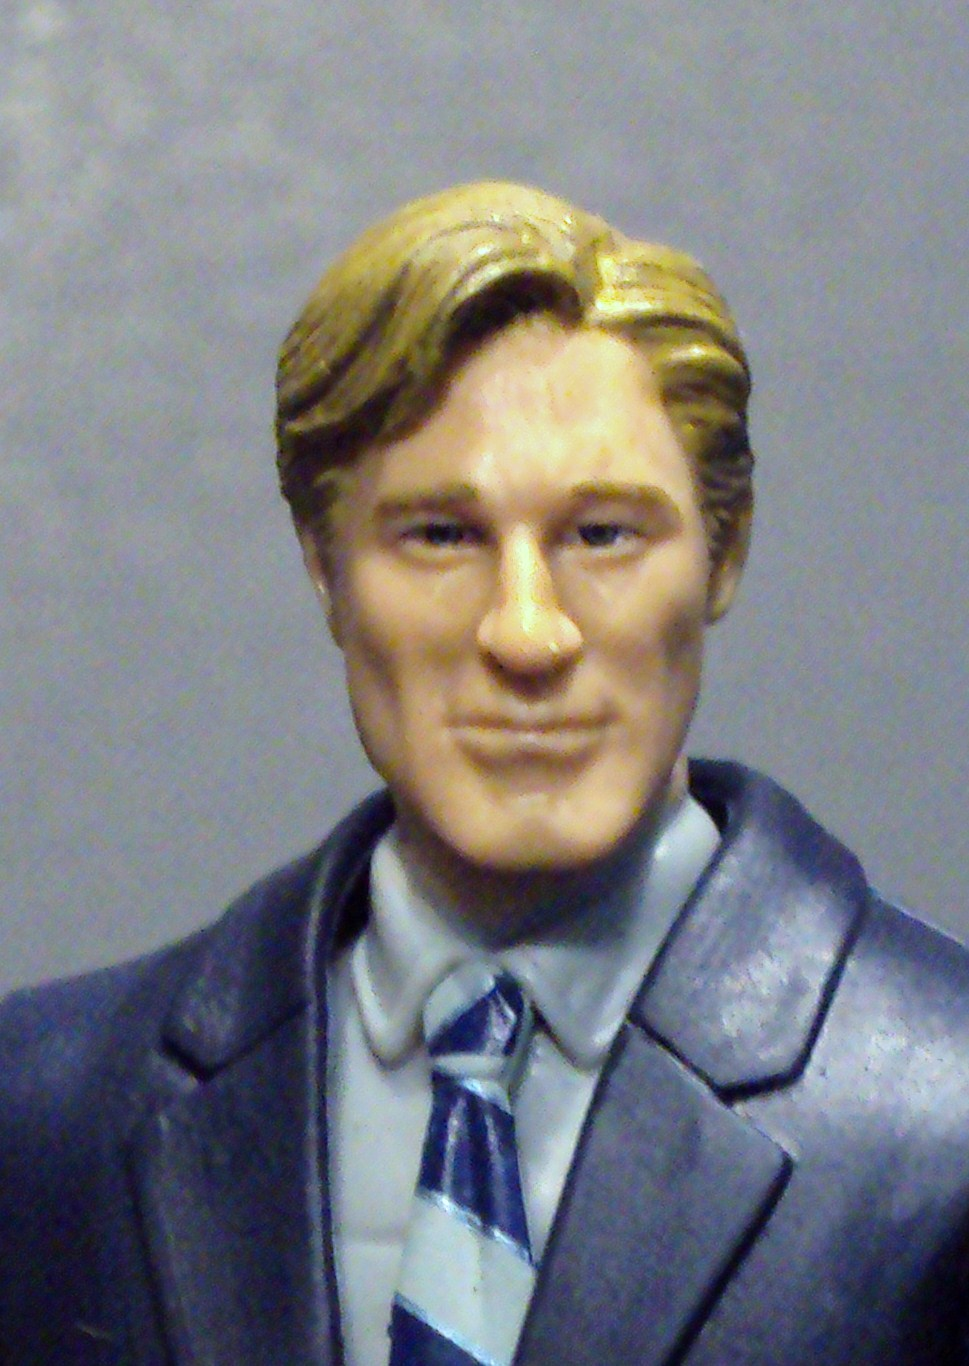 Harvey Dent New Earth: 3B's Toy Hive: Stinger Shots: Harvey Dent & Two-Face